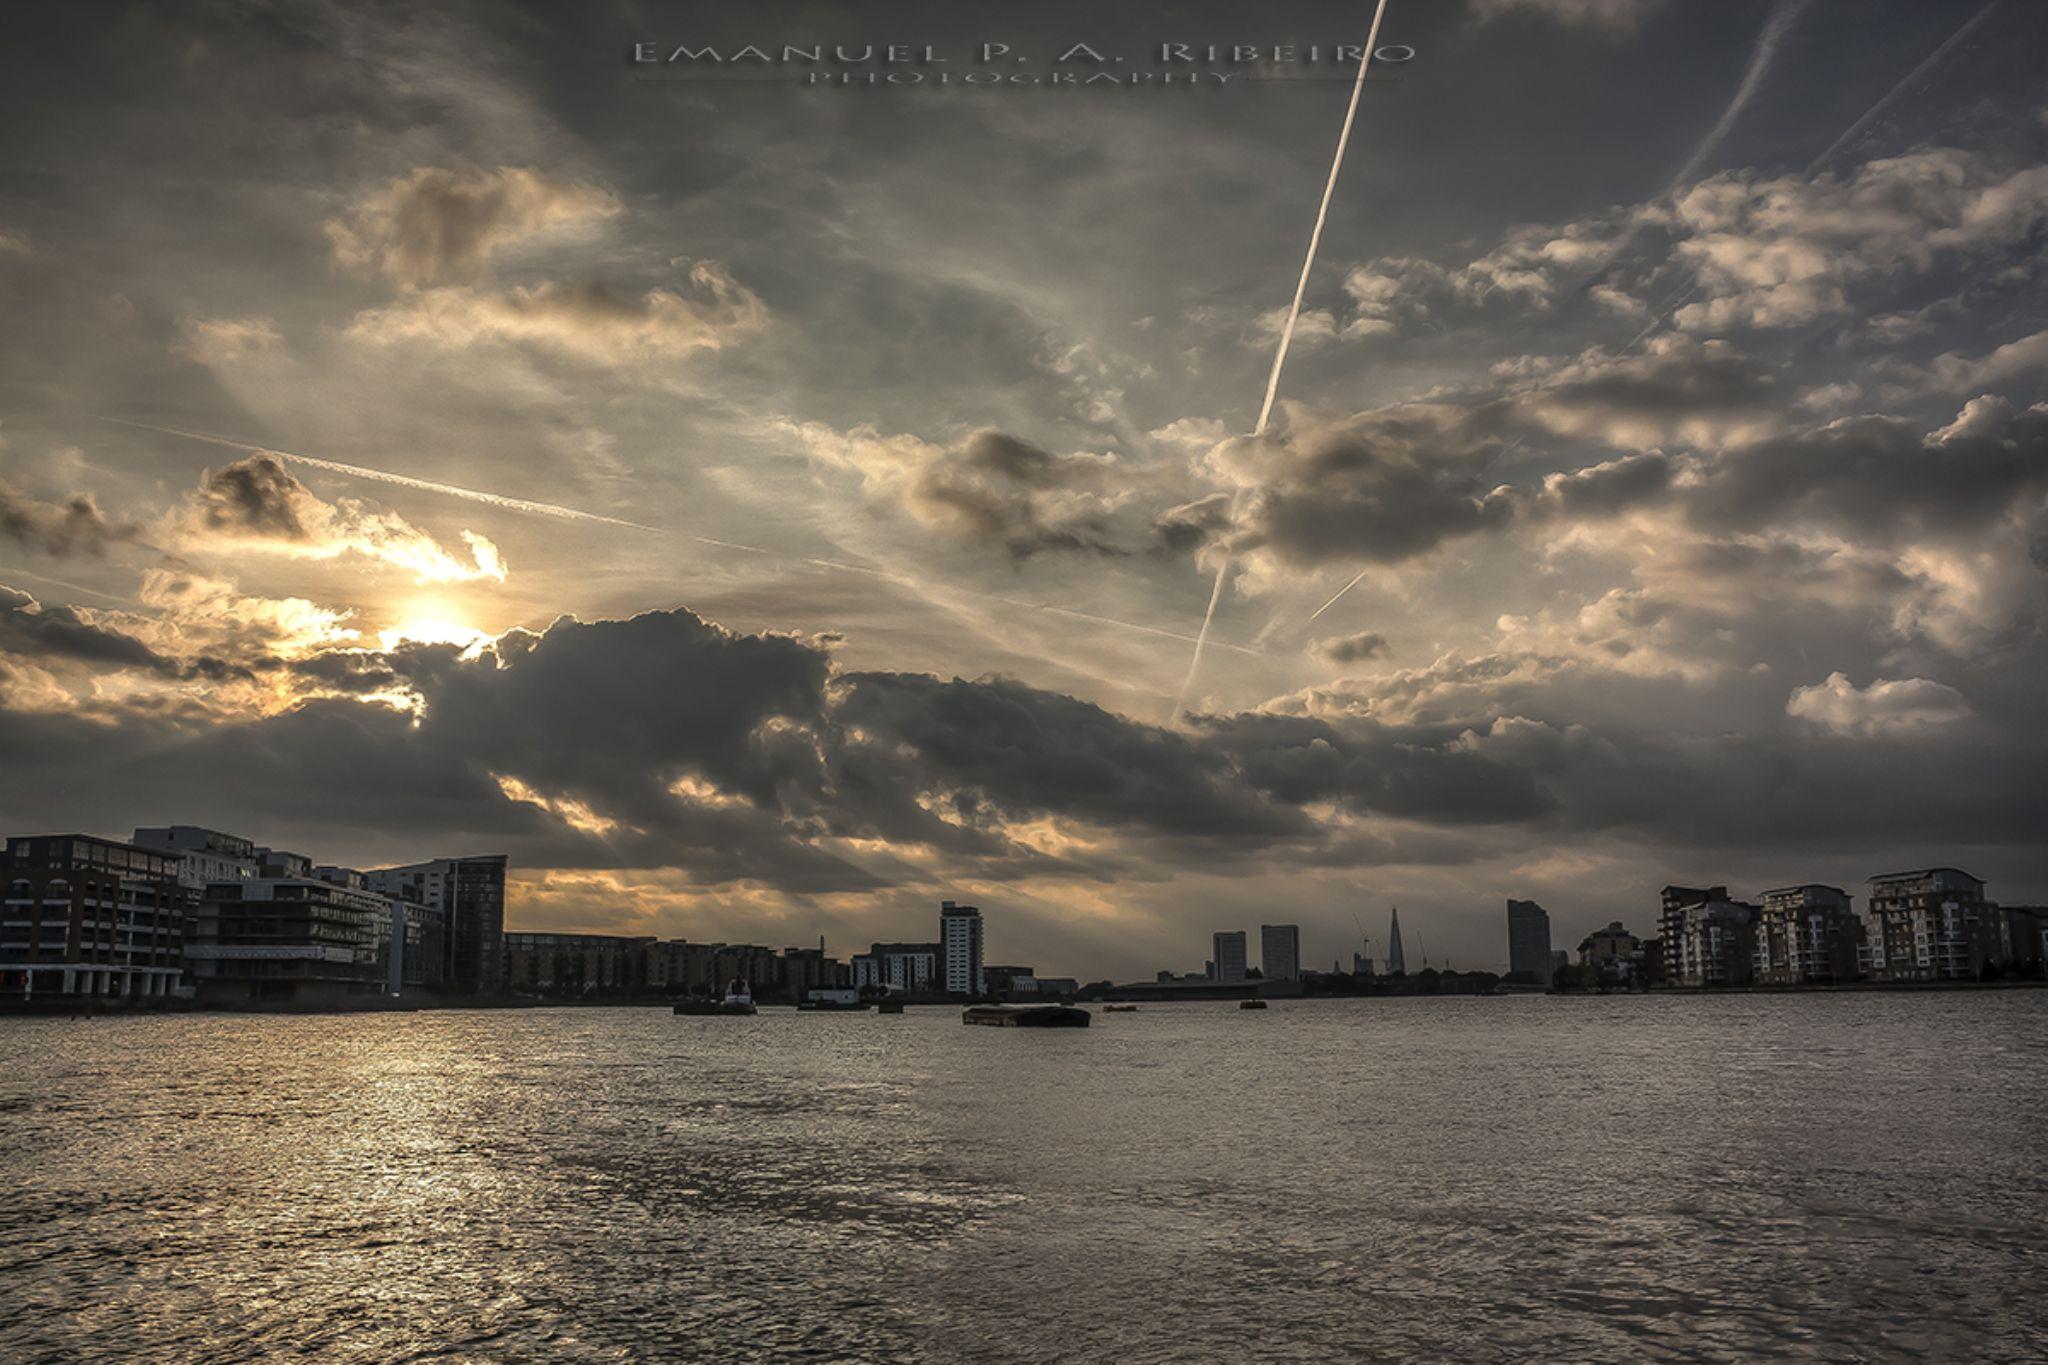 end of day in Greenwich by Emanuel Pereira Aparicio Ribeiro